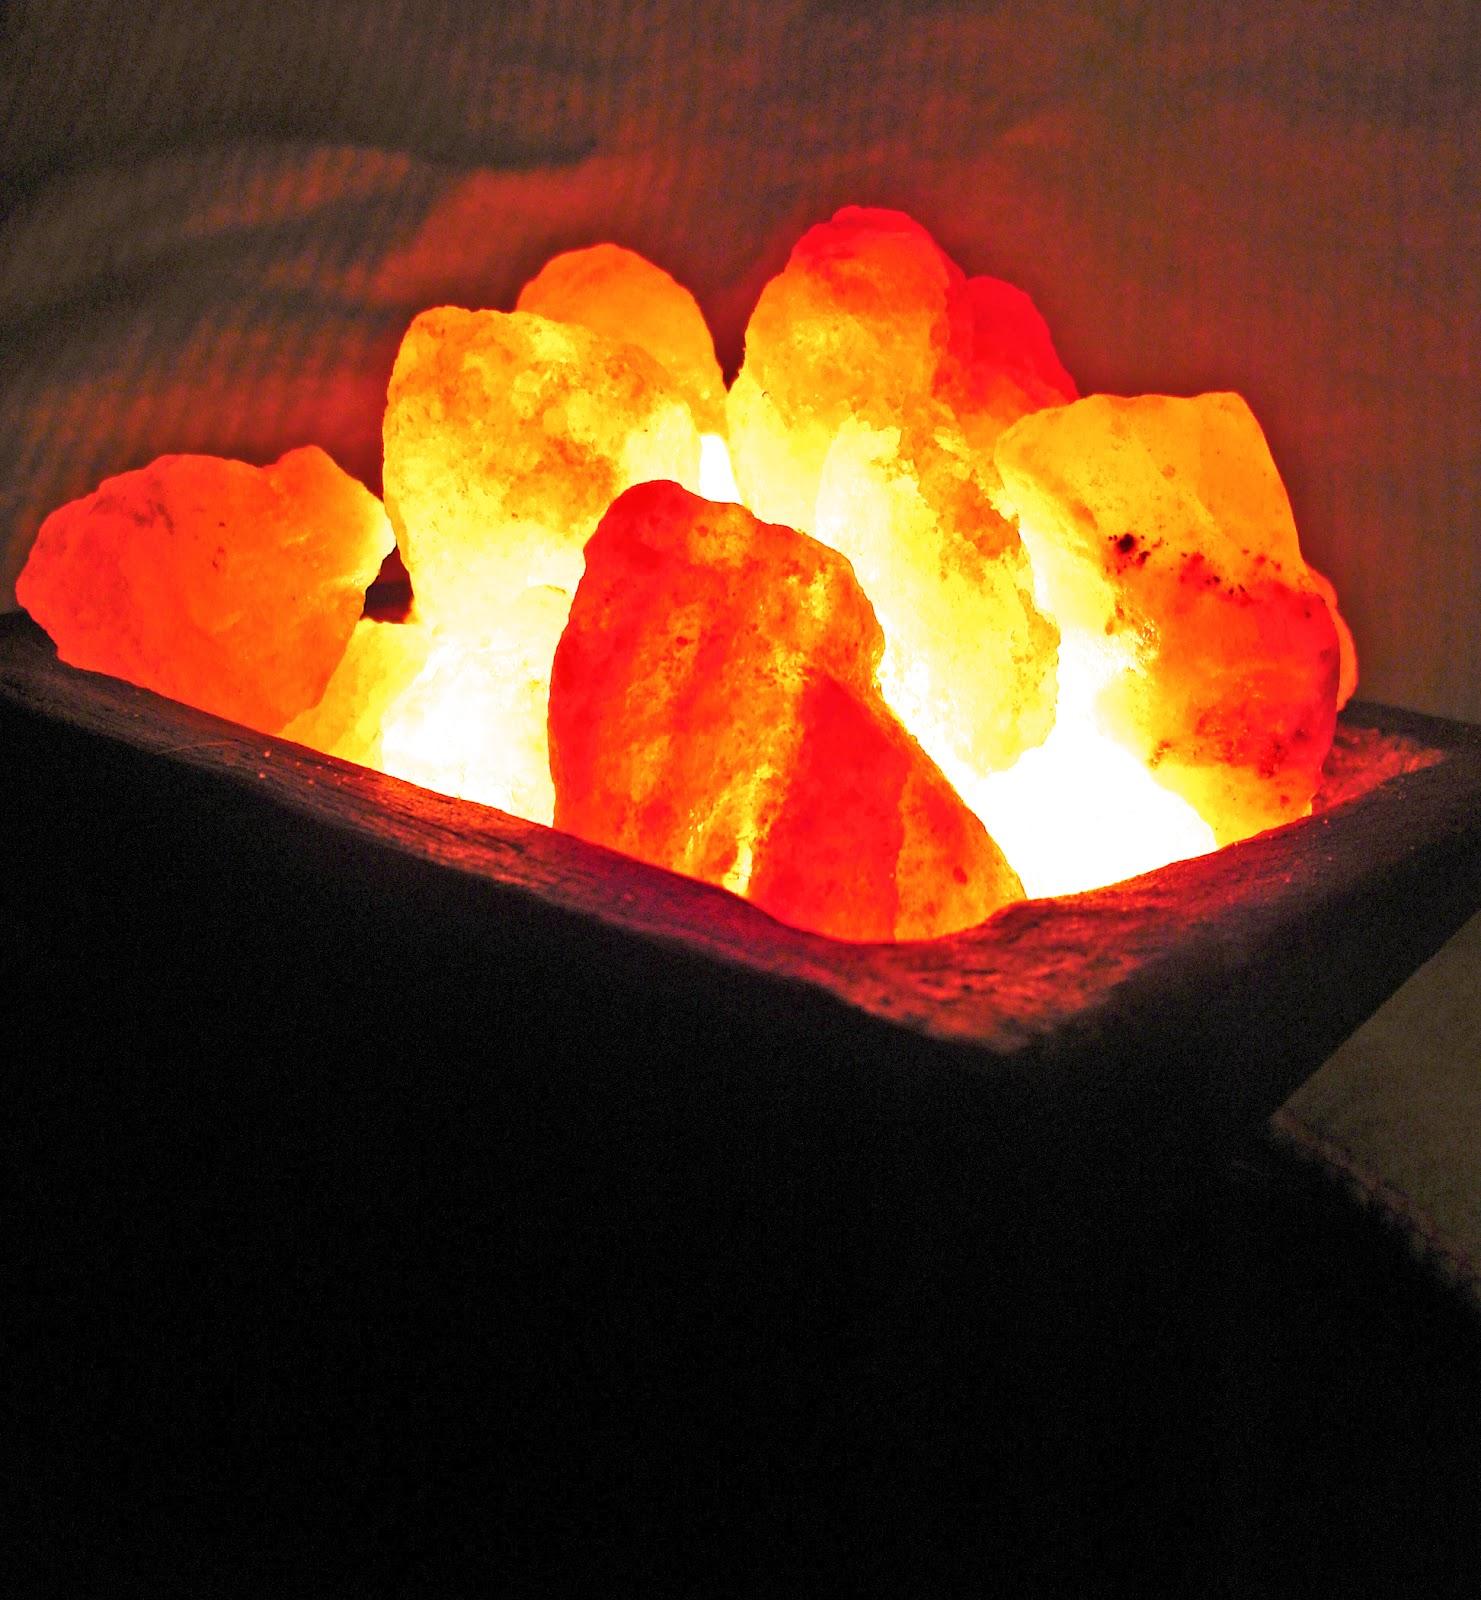 Kinnari l mparas de sal del himalaya - Lamparas de sal para que sirven ...